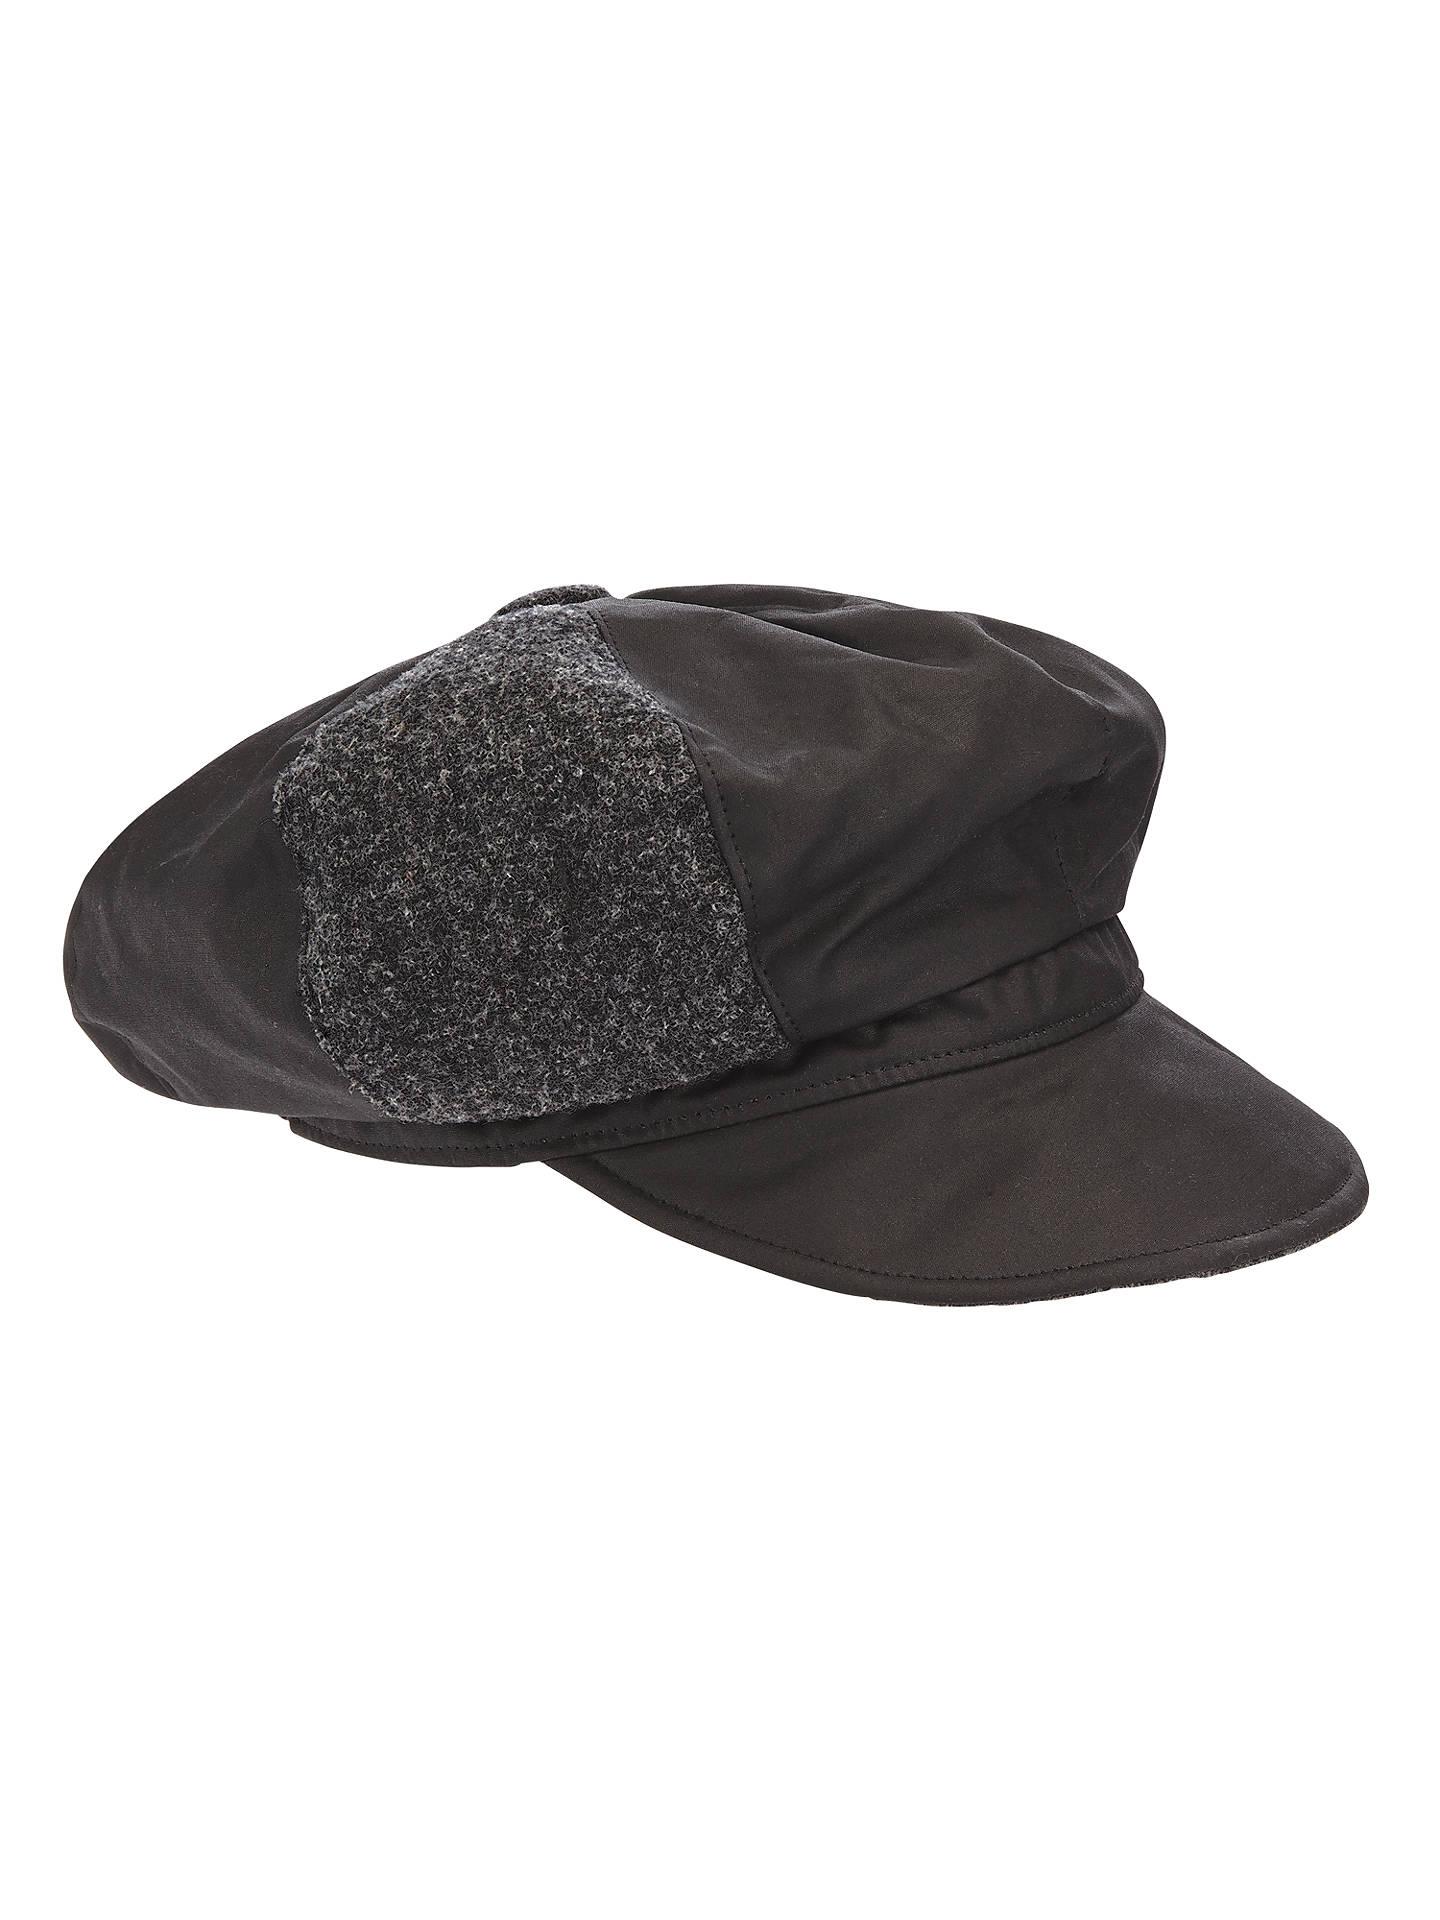 2b4a54353 Olney Ellie Tweed Waxed Cotton Bakerboy Rain Hat, Black at John ...